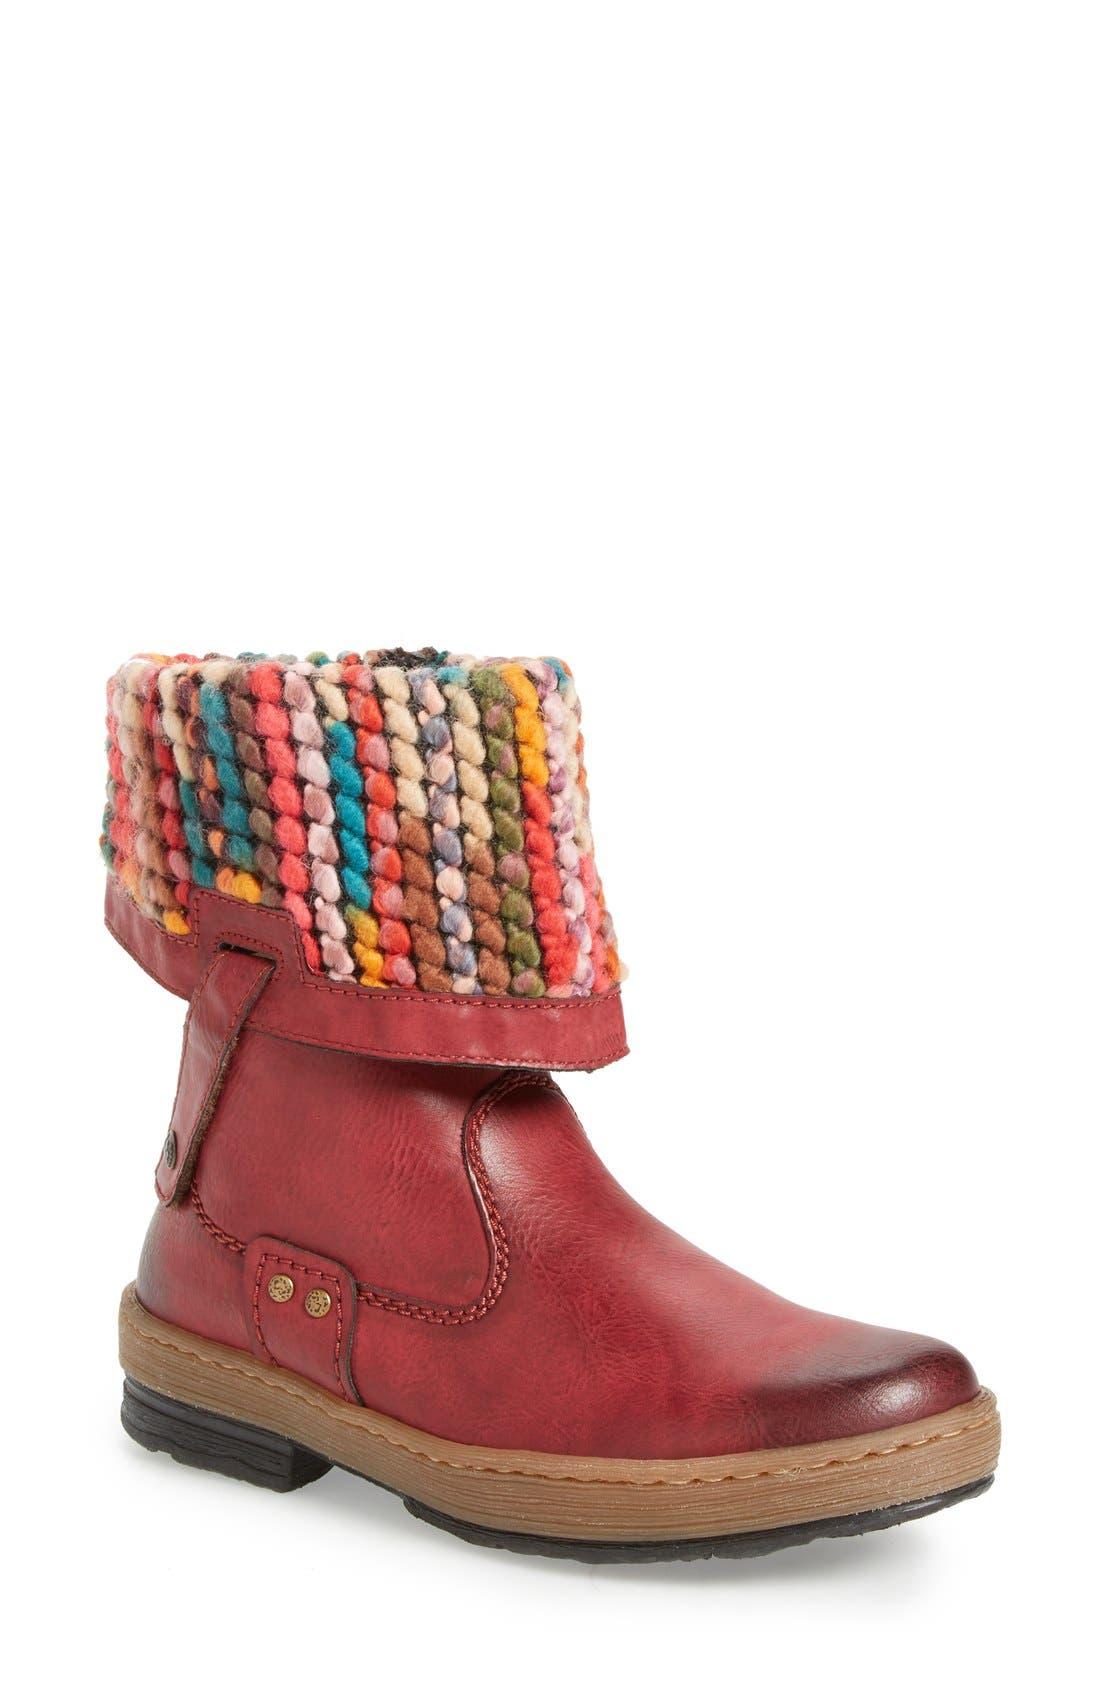 Alternate Image 1 Selected - Rieker Antistress 'Felicitas 98' Foldover Boot (Women)